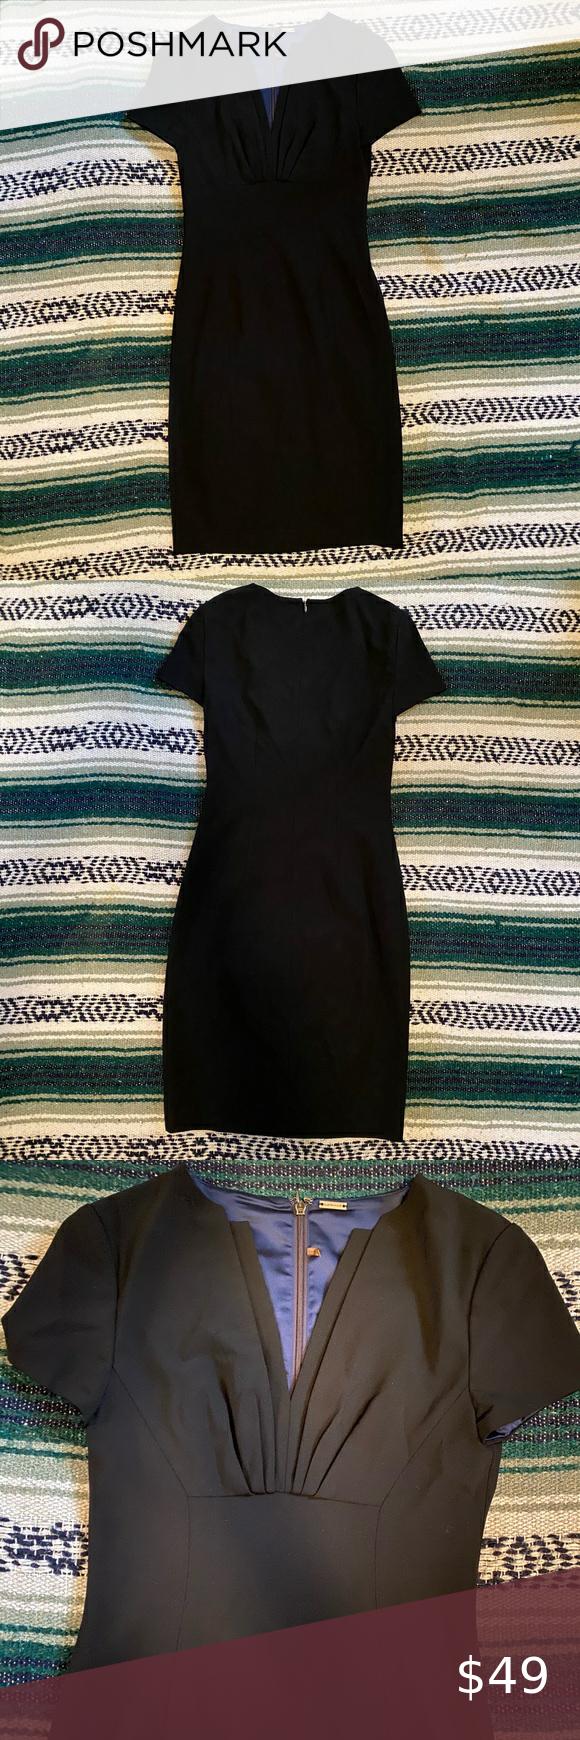 Elie Tahari Black Dress With V Neck Cap Sleeves Elie Tahari Dresses Capped Sleeve Dress Elie Tahari [ 1740 x 580 Pixel ]